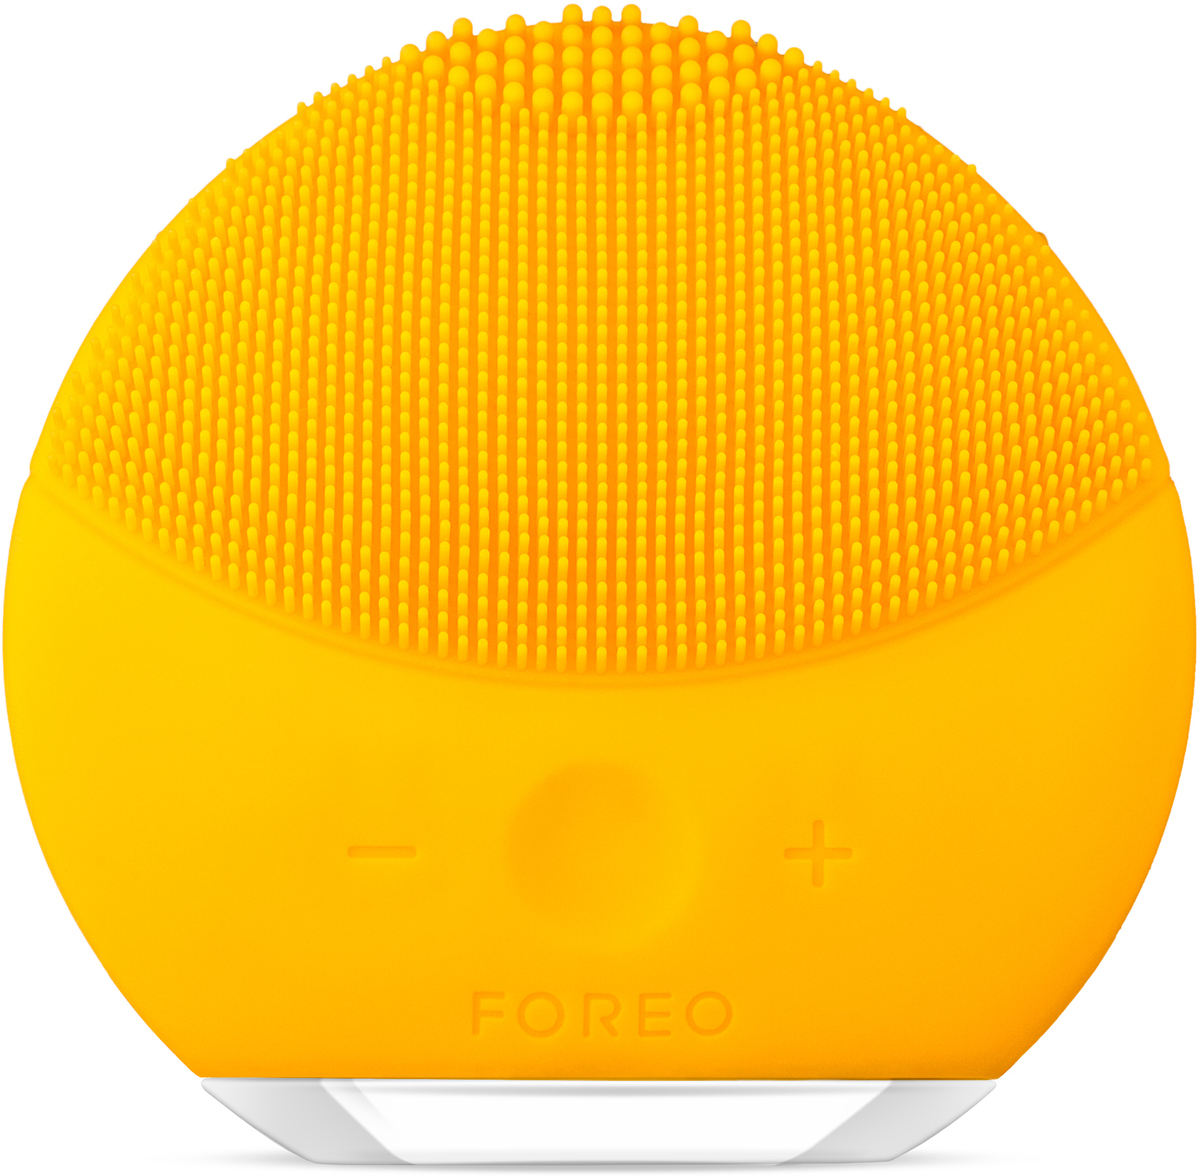 Foreo Щетка для очищения лица LUNA mini 2, цвет: Sunflower Yellow (желтый) - Косметологические аппараты